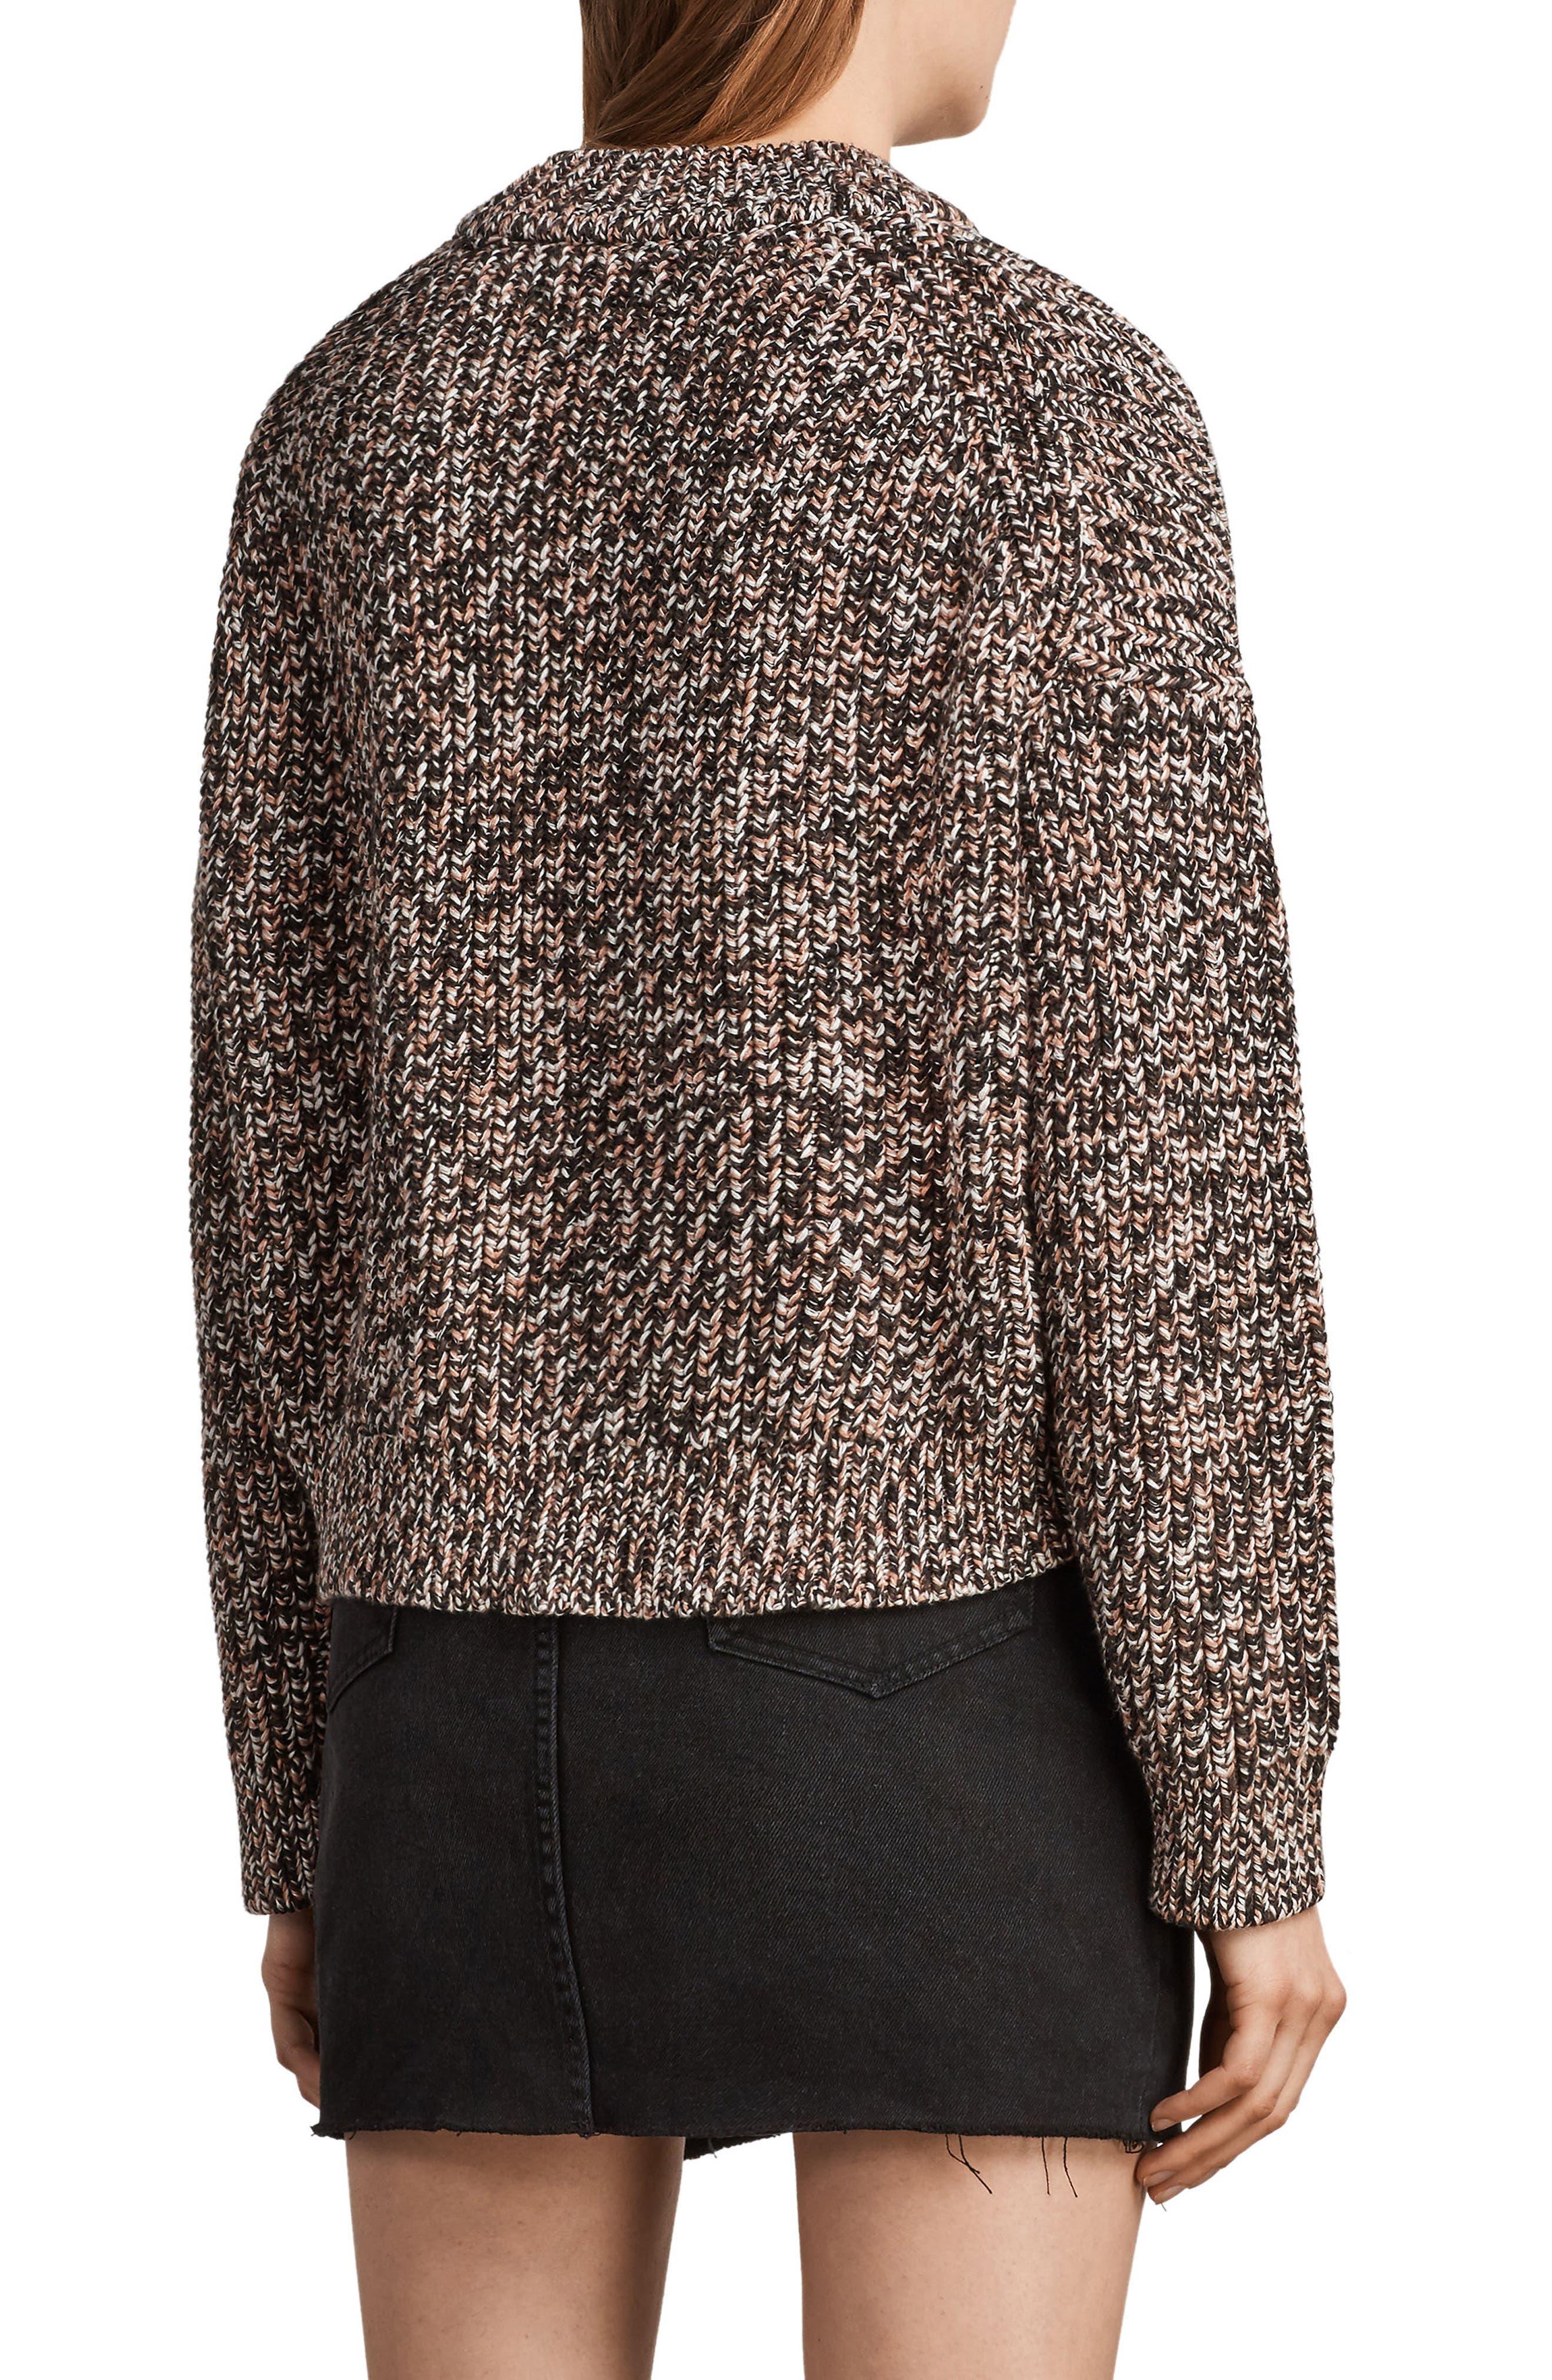 Malu Knit Sweater,                             Alternate thumbnail 2, color,                             Pink Mix